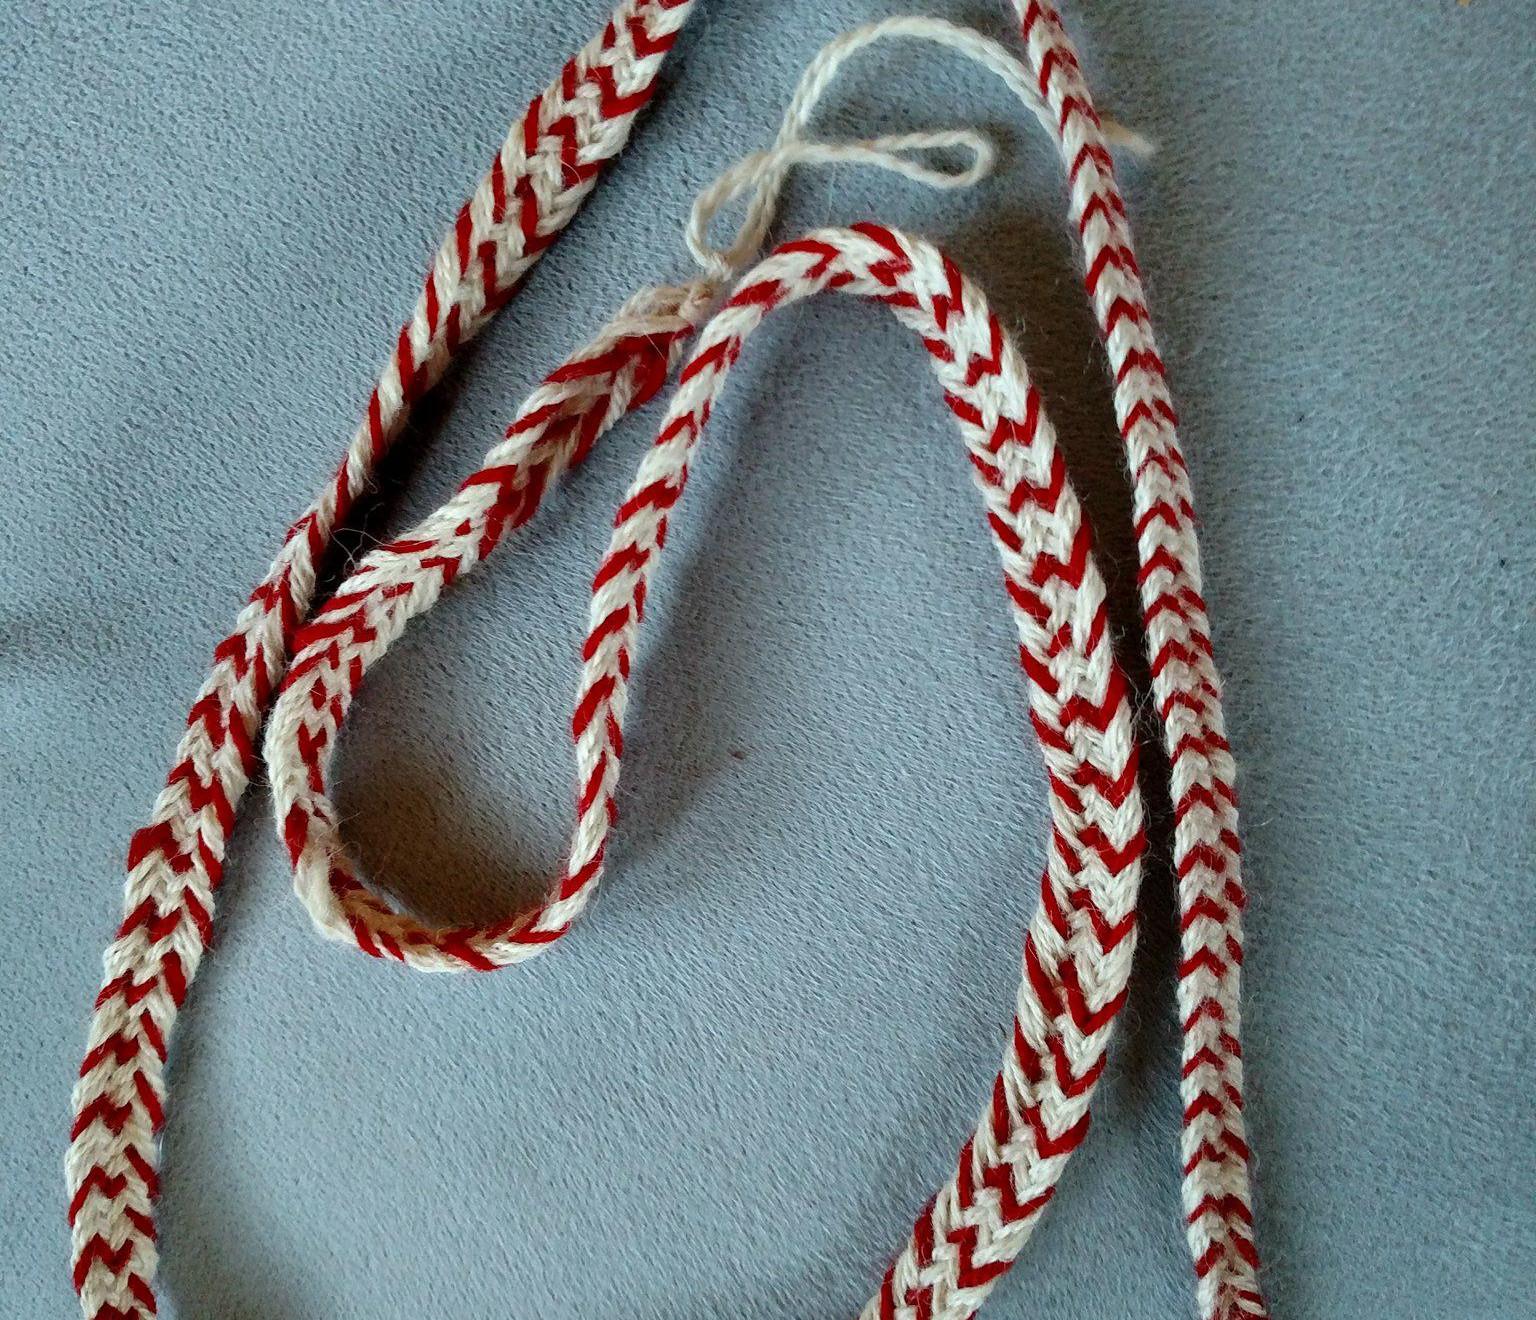 12-strand braid for breeches drawstring